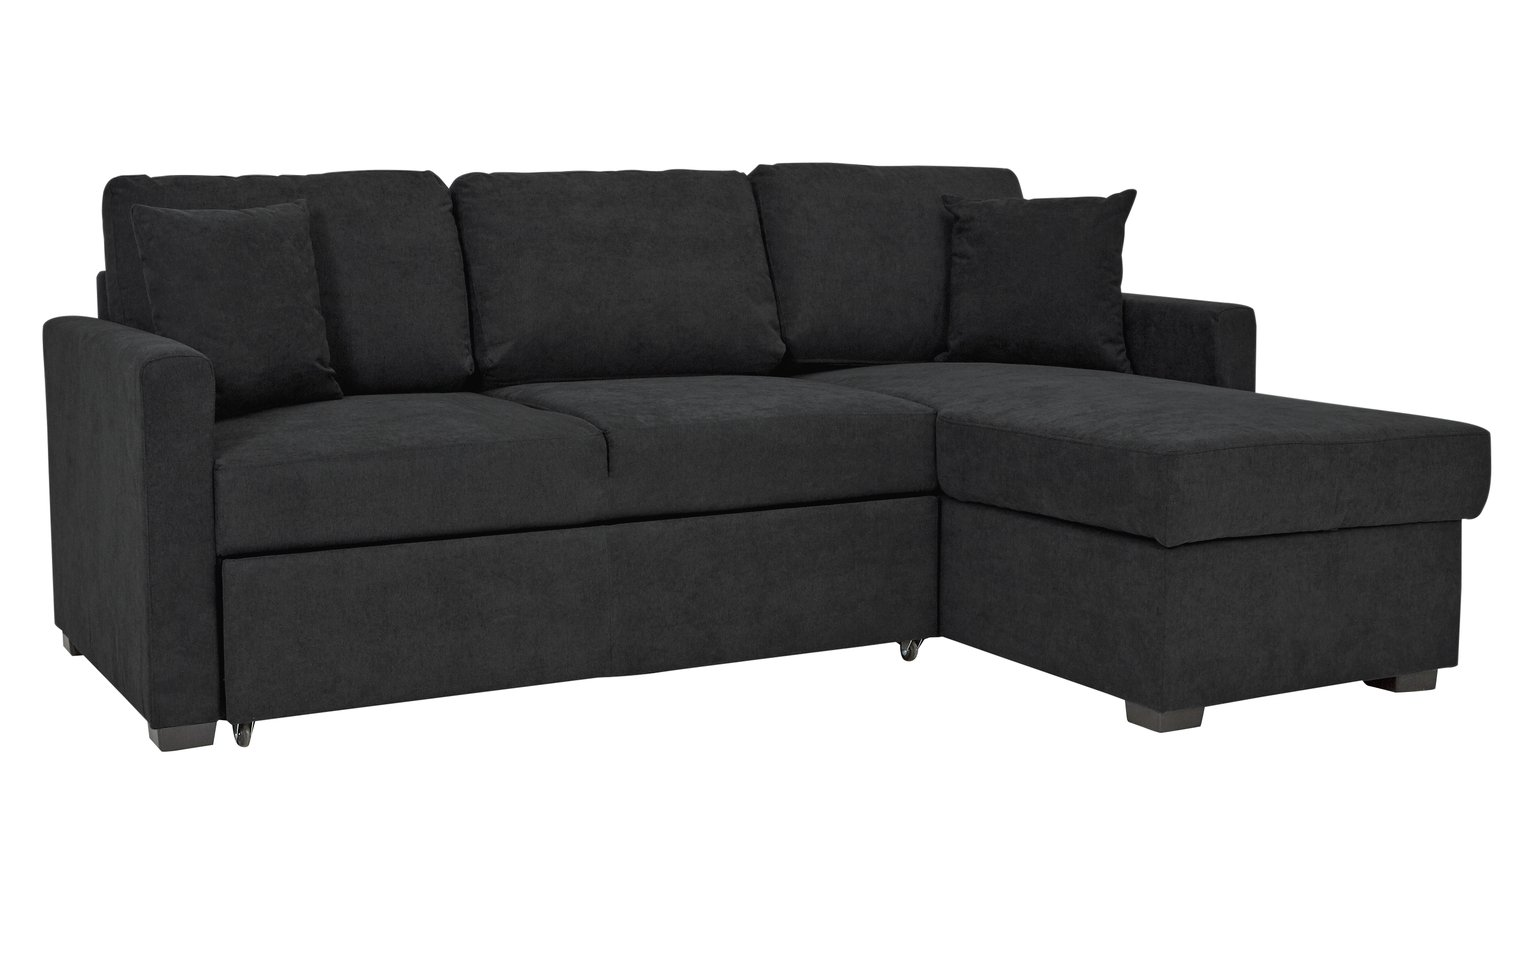 buy argos home reagan right corner fabric sofa bed charcoal rh argos co uk sofa bed corner uk sofa bed corner couch